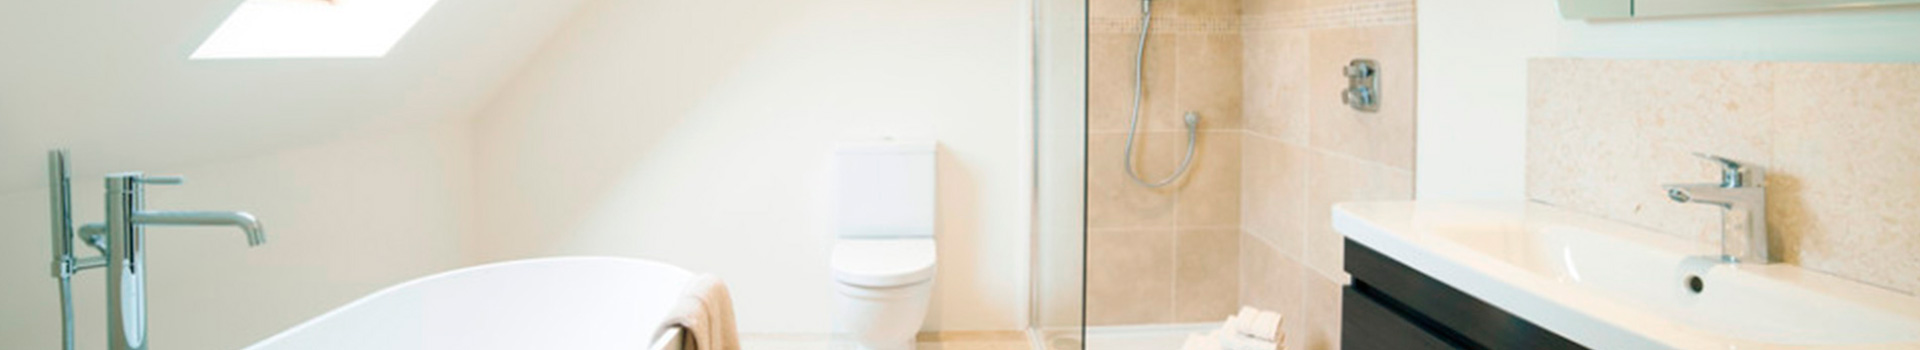 RIANJE - Reformas lowcost baños Murcia